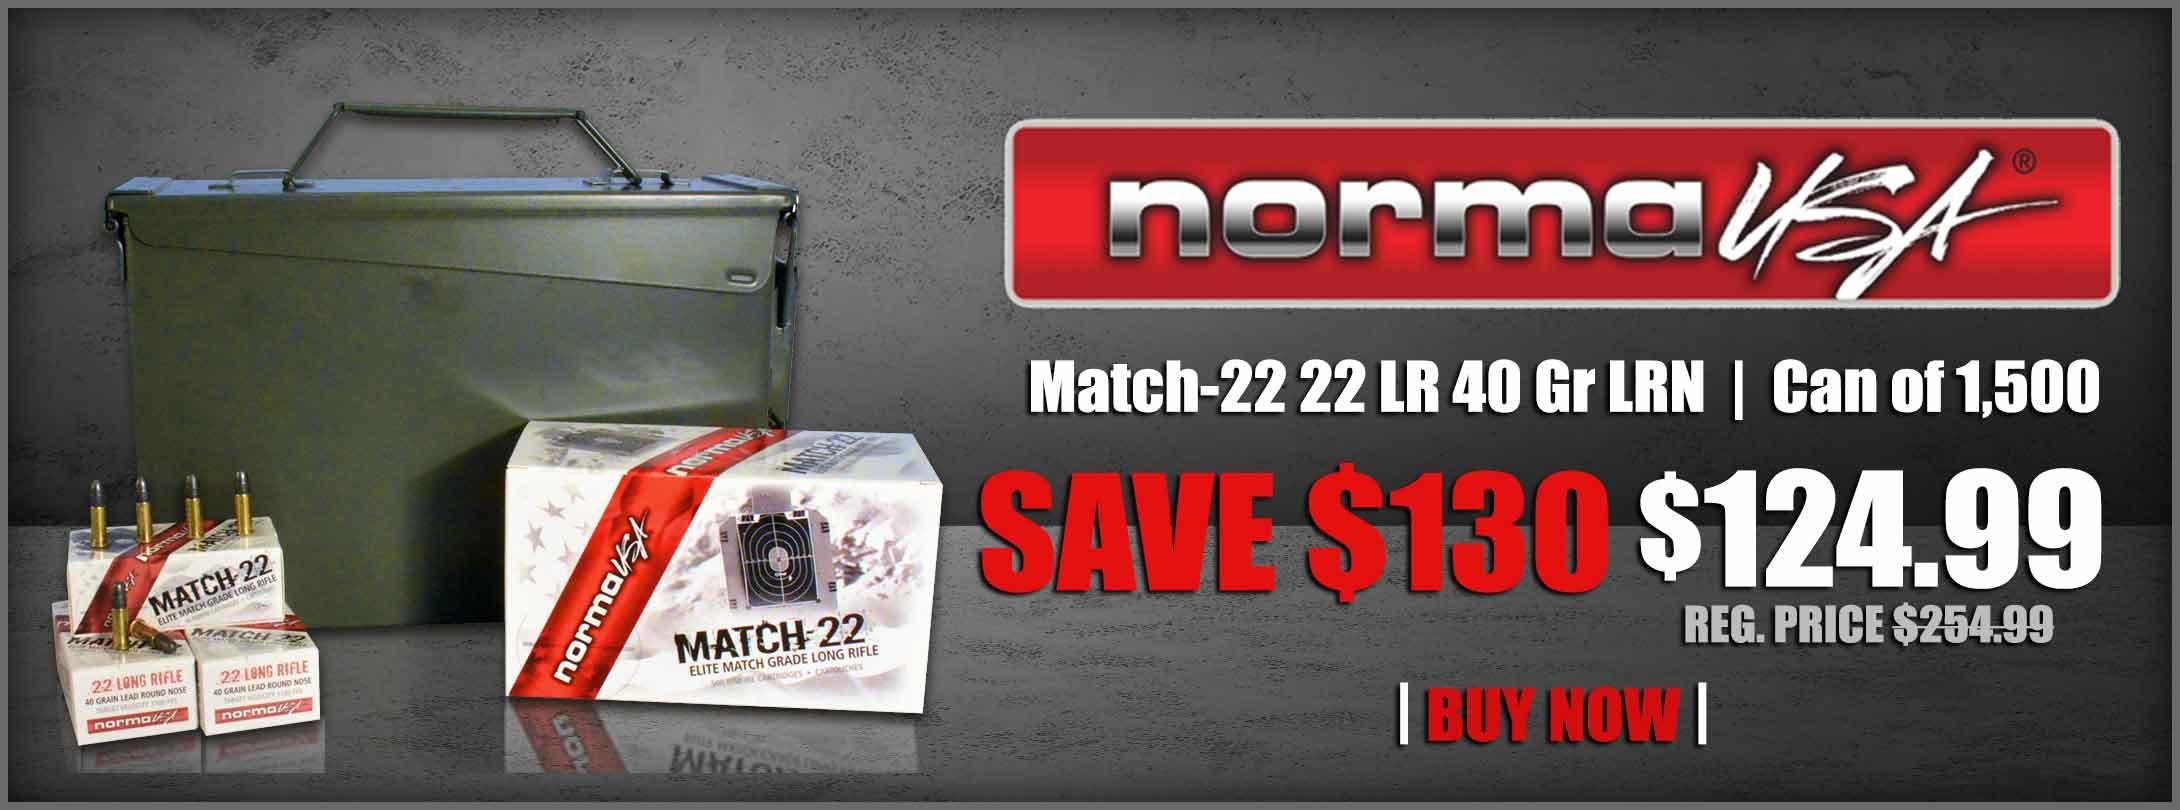 MidwayUSA Norma Match-22 22 LR Ammo rimfire ammunition